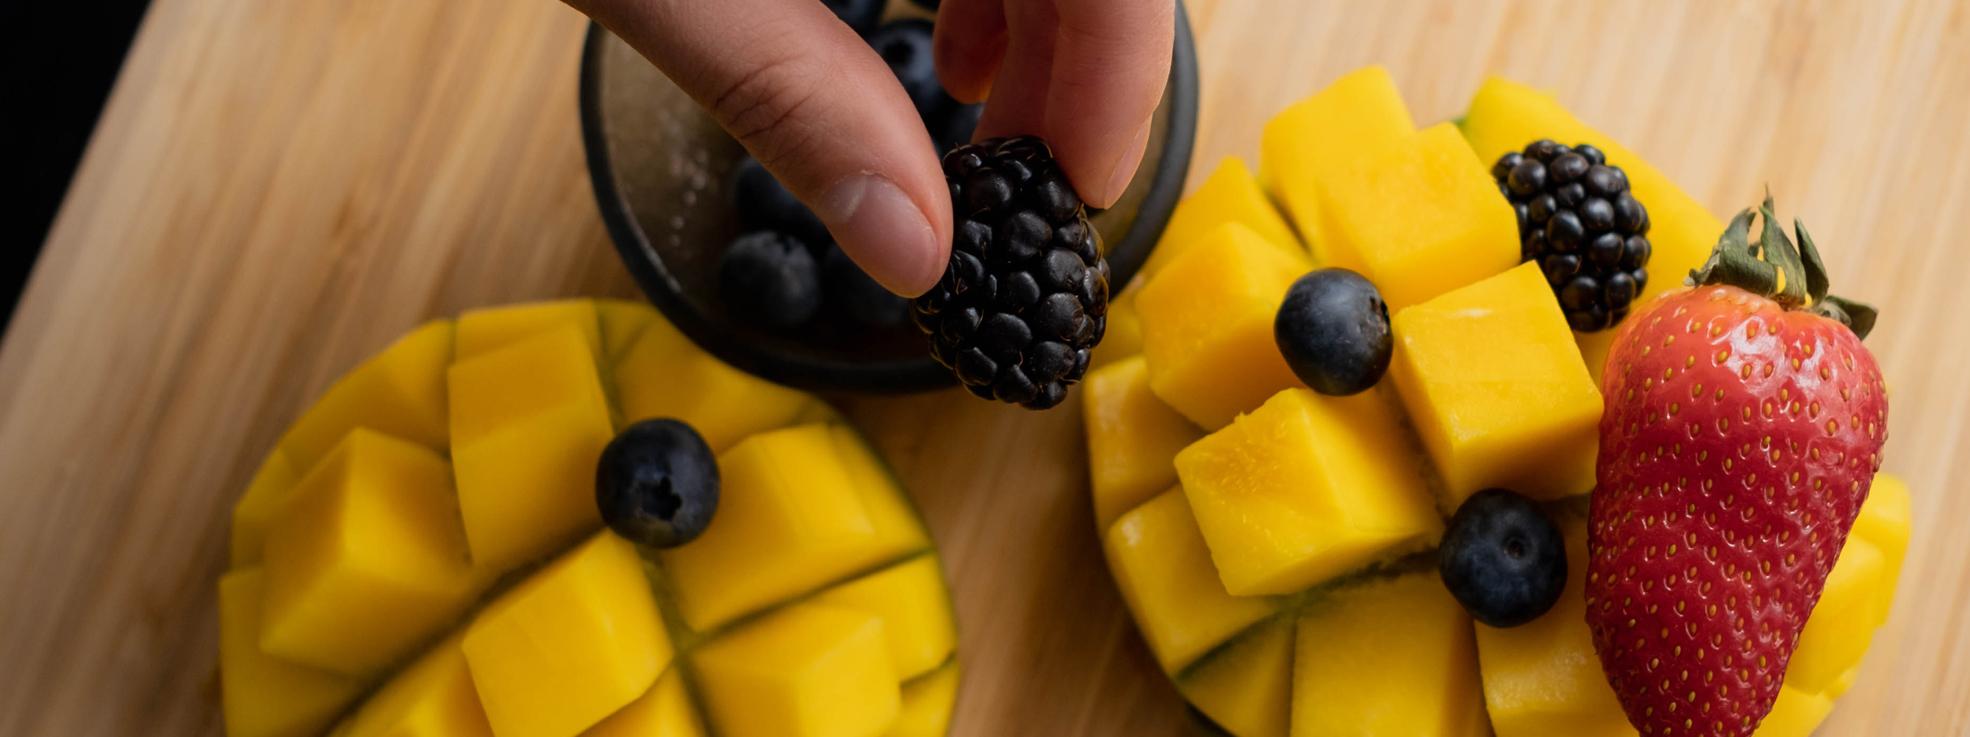 Health Benefits of Eating Mangoes